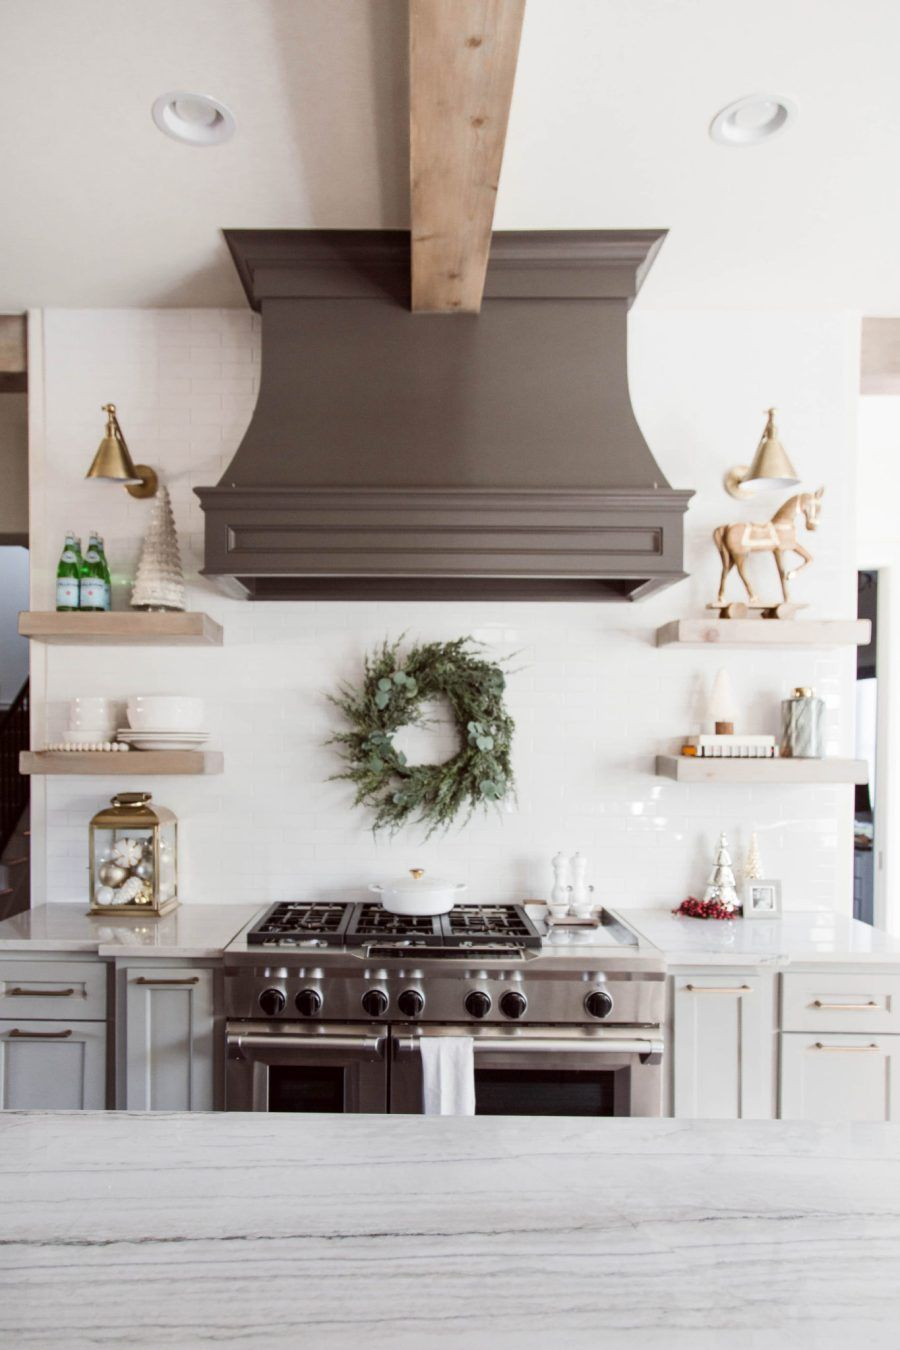 cozy christmas kitchen christmas kitchen decor home remodeling on kitchen xmas decor id=64758